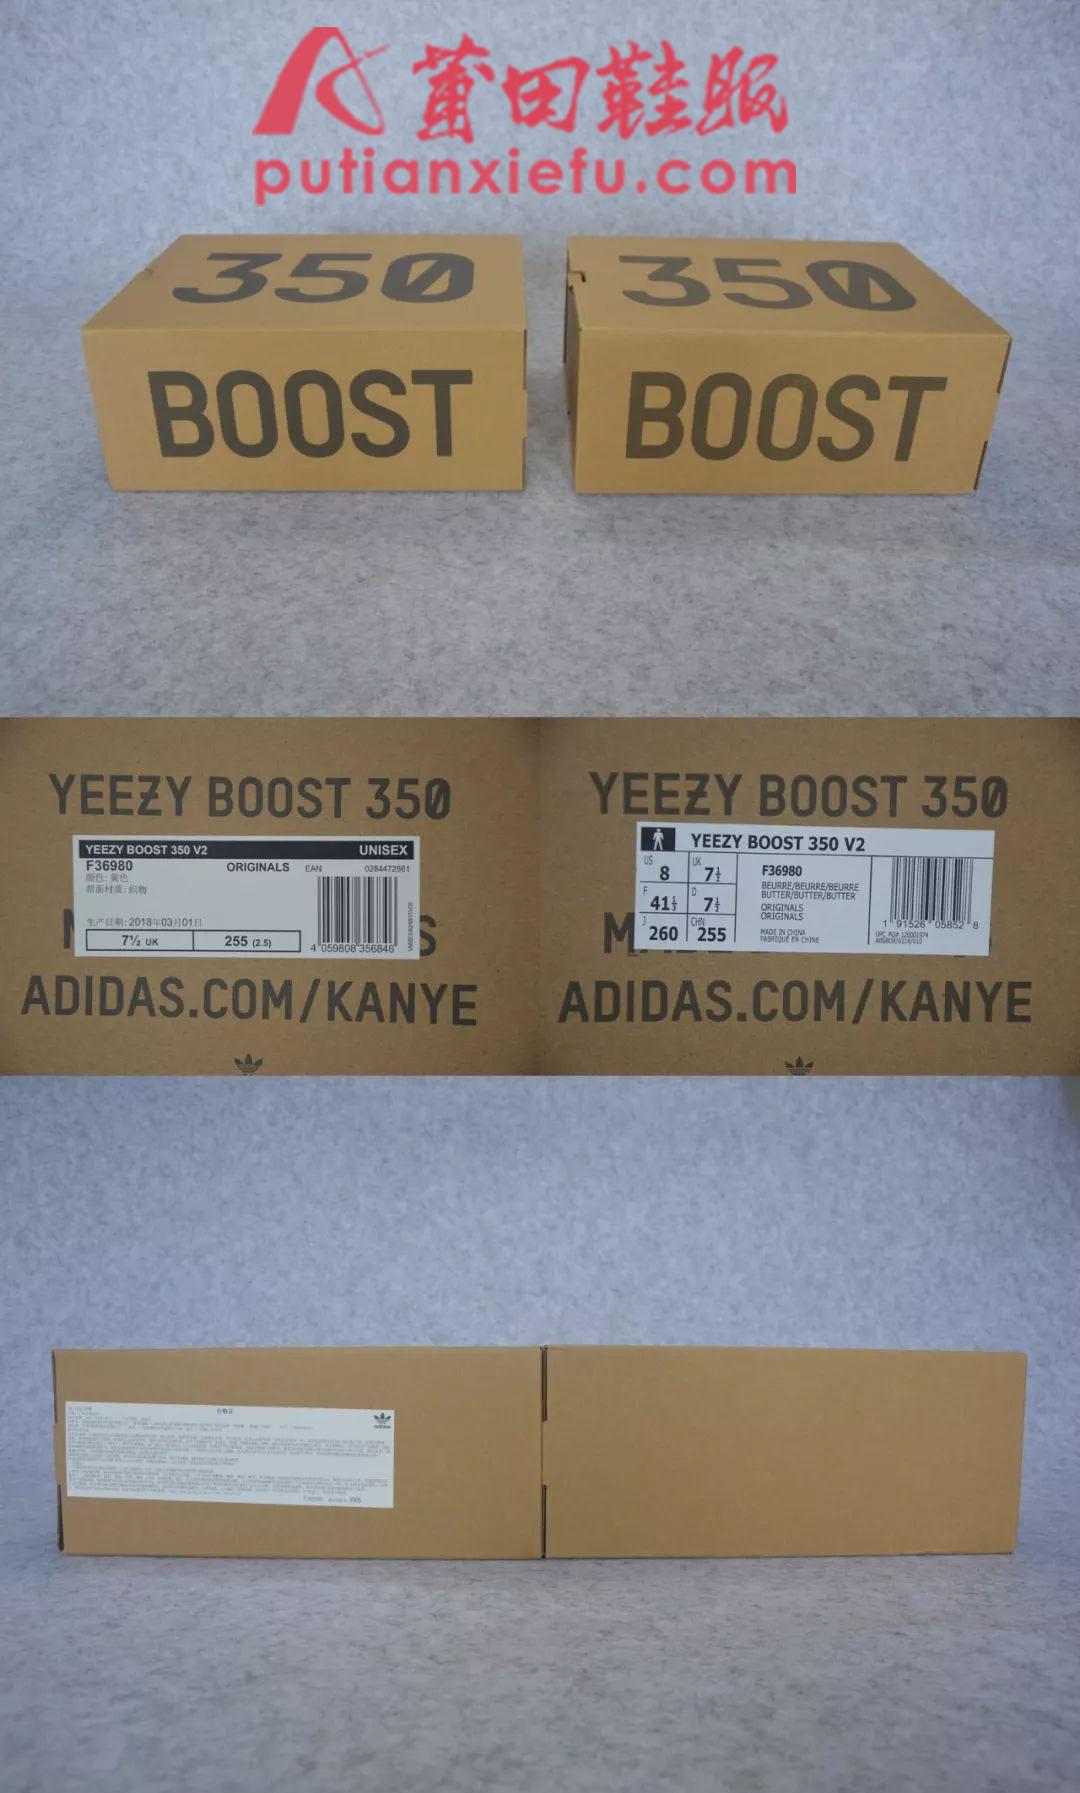 adidas Yeezy Boost 350 V2 黄油 真假对比 评测